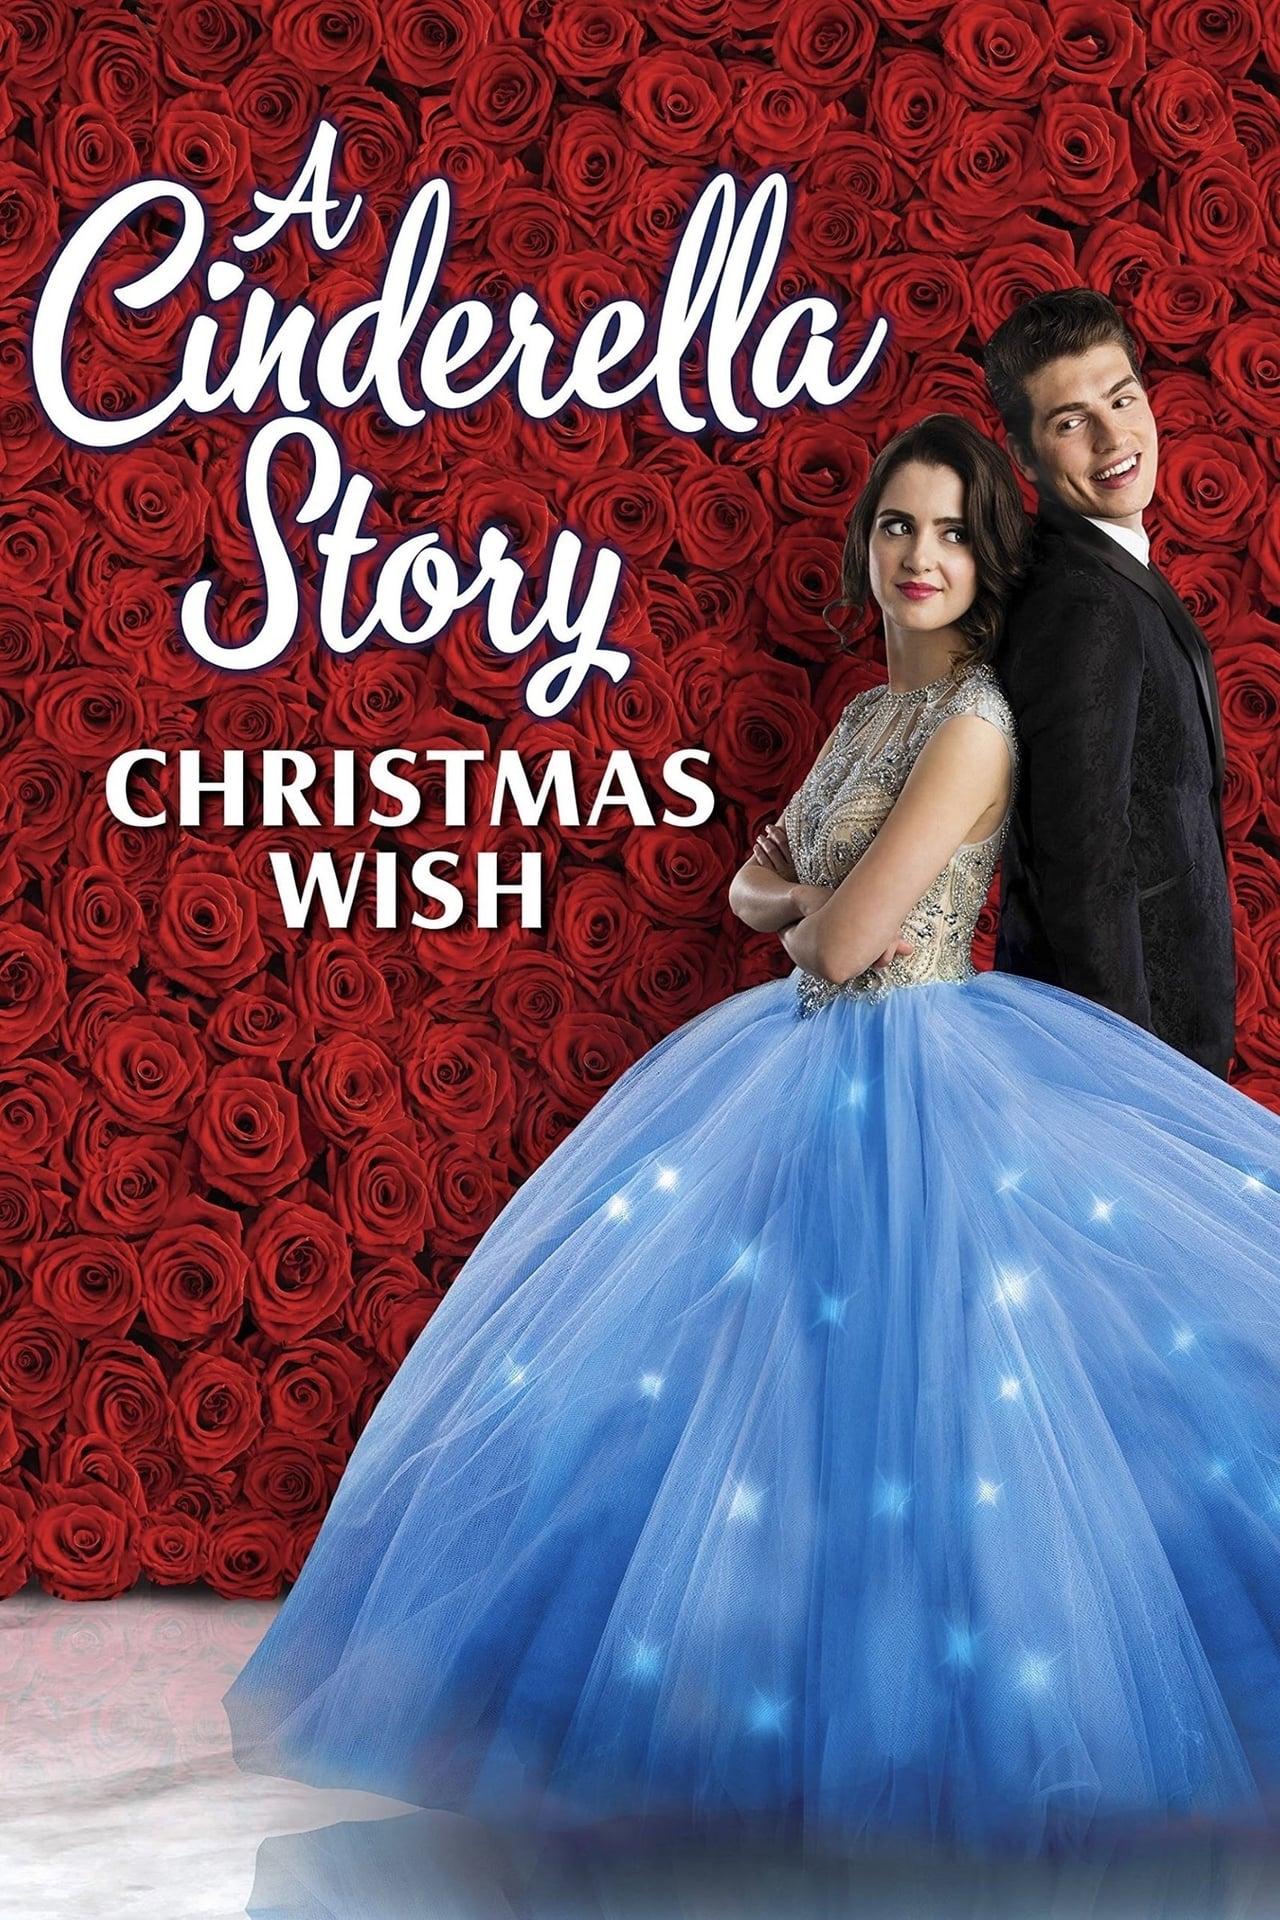 Watch Free A Cinderella Story: Christmas Wish (2019) Online Full Movie at imdb.playnowstore.com